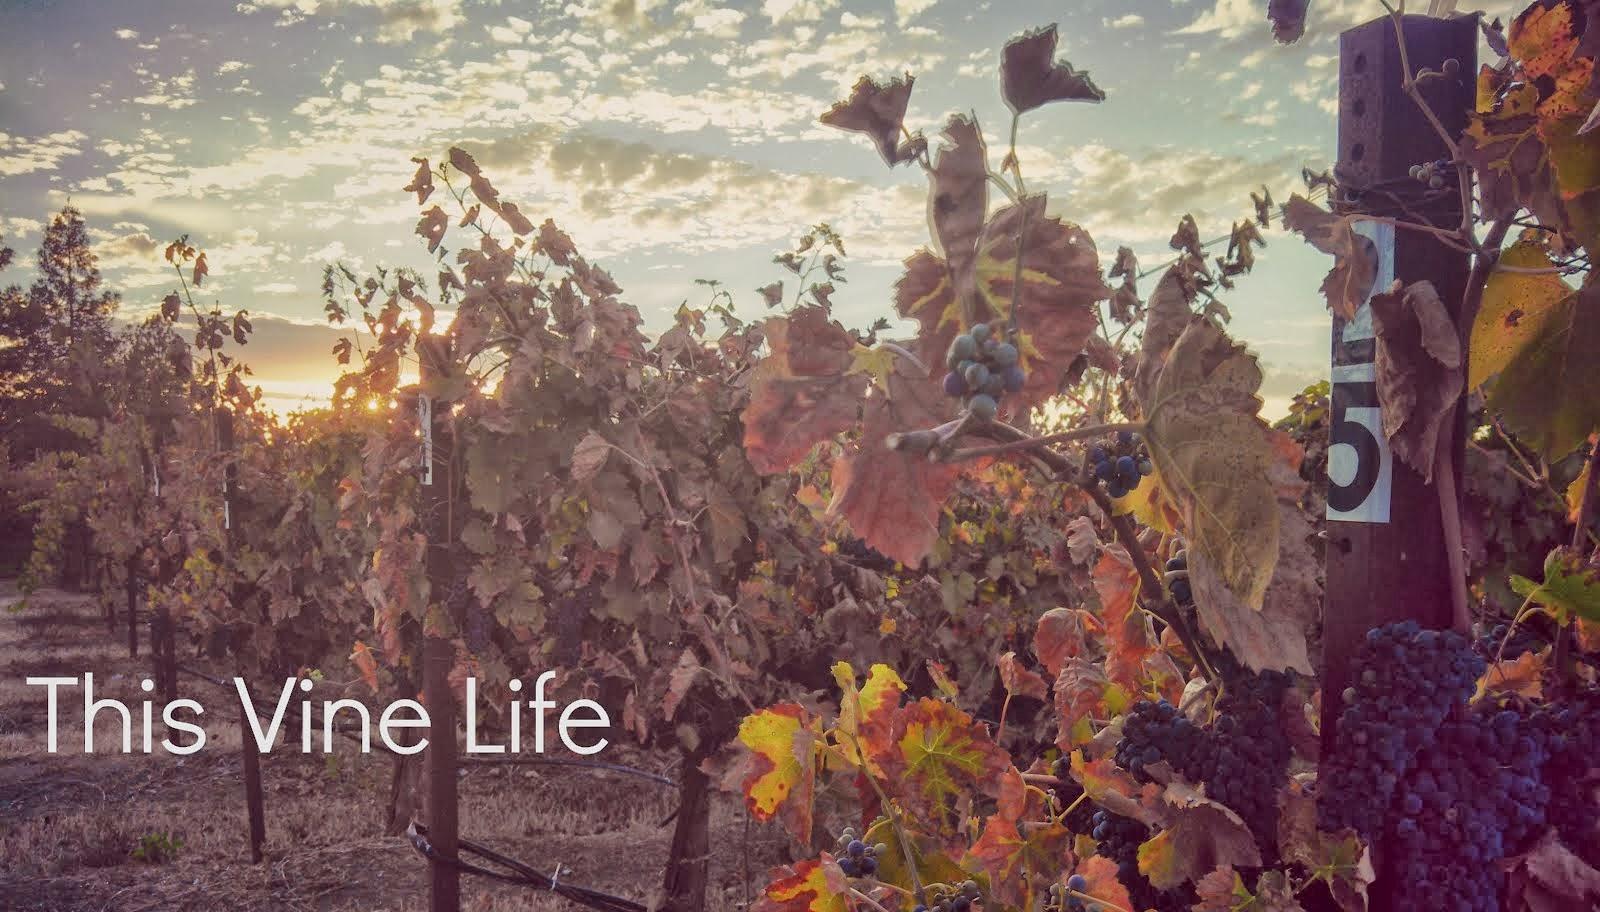 This Vine Life